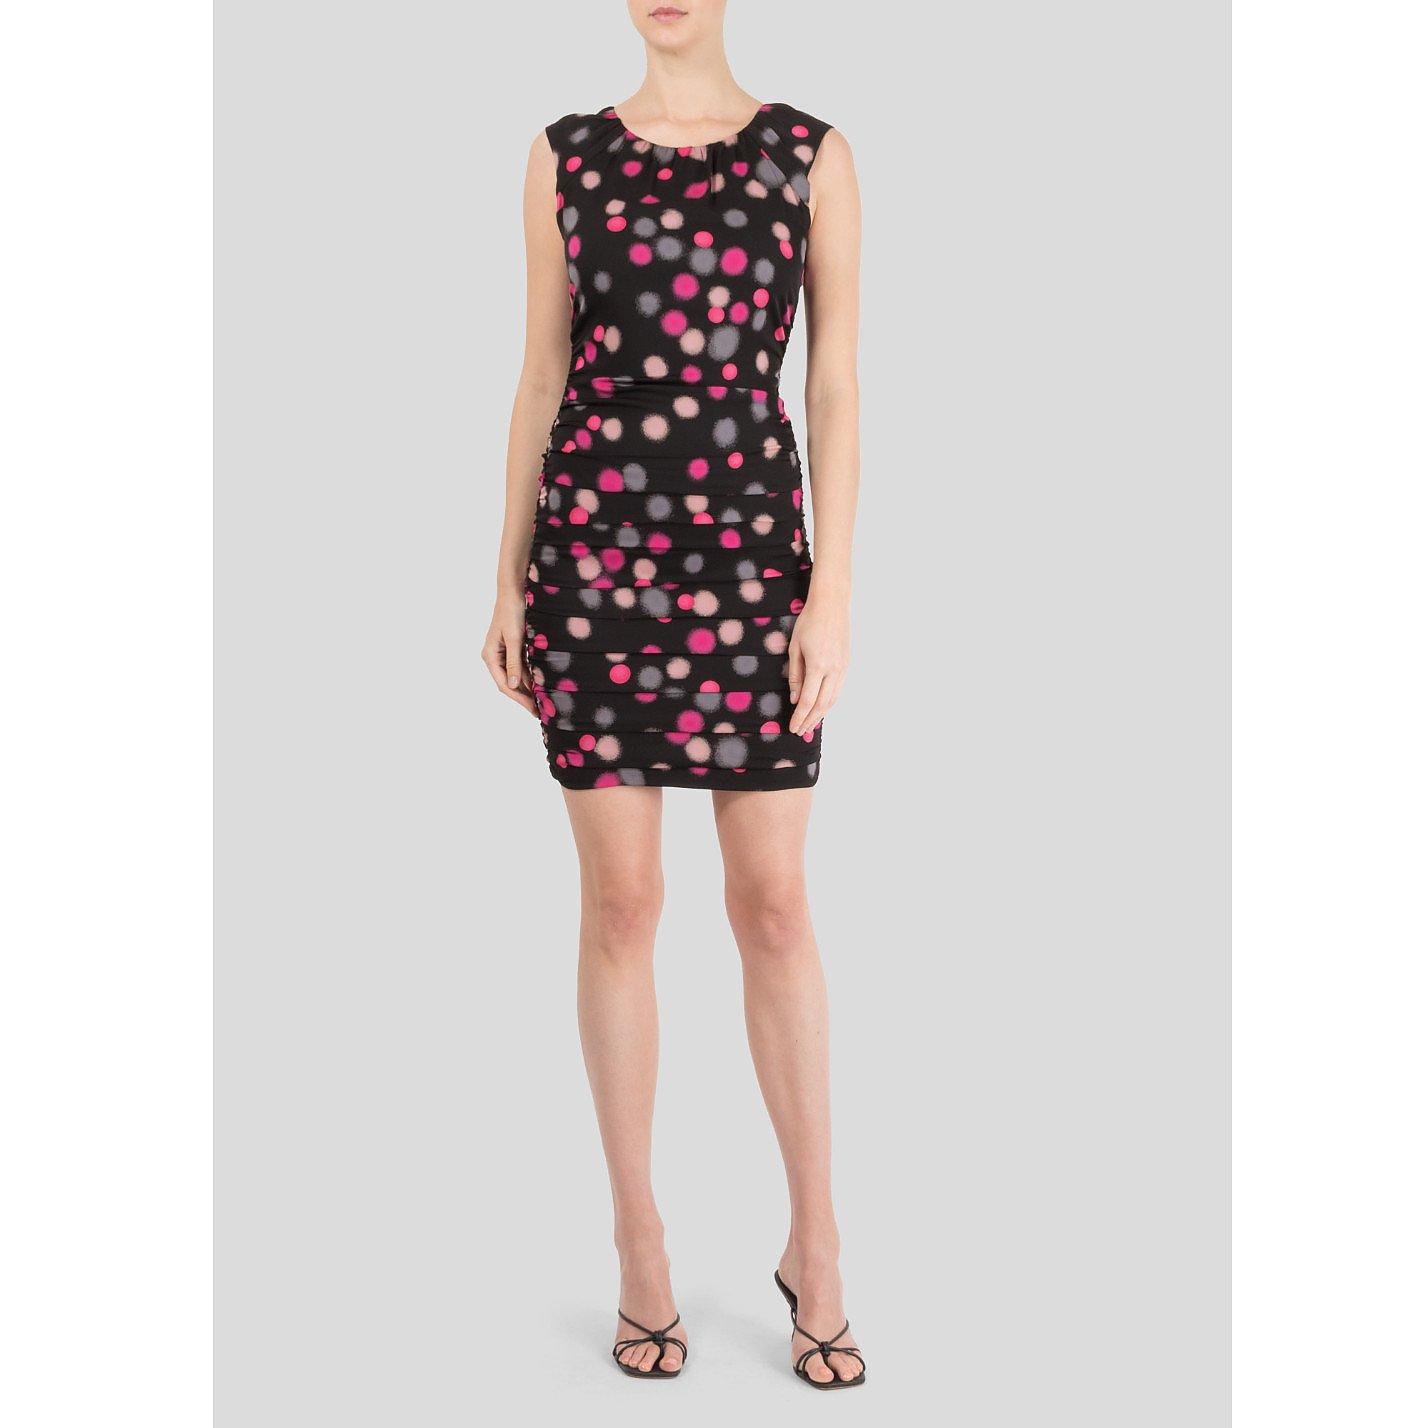 Diane von Furstenberg Polka Dot Print Dress